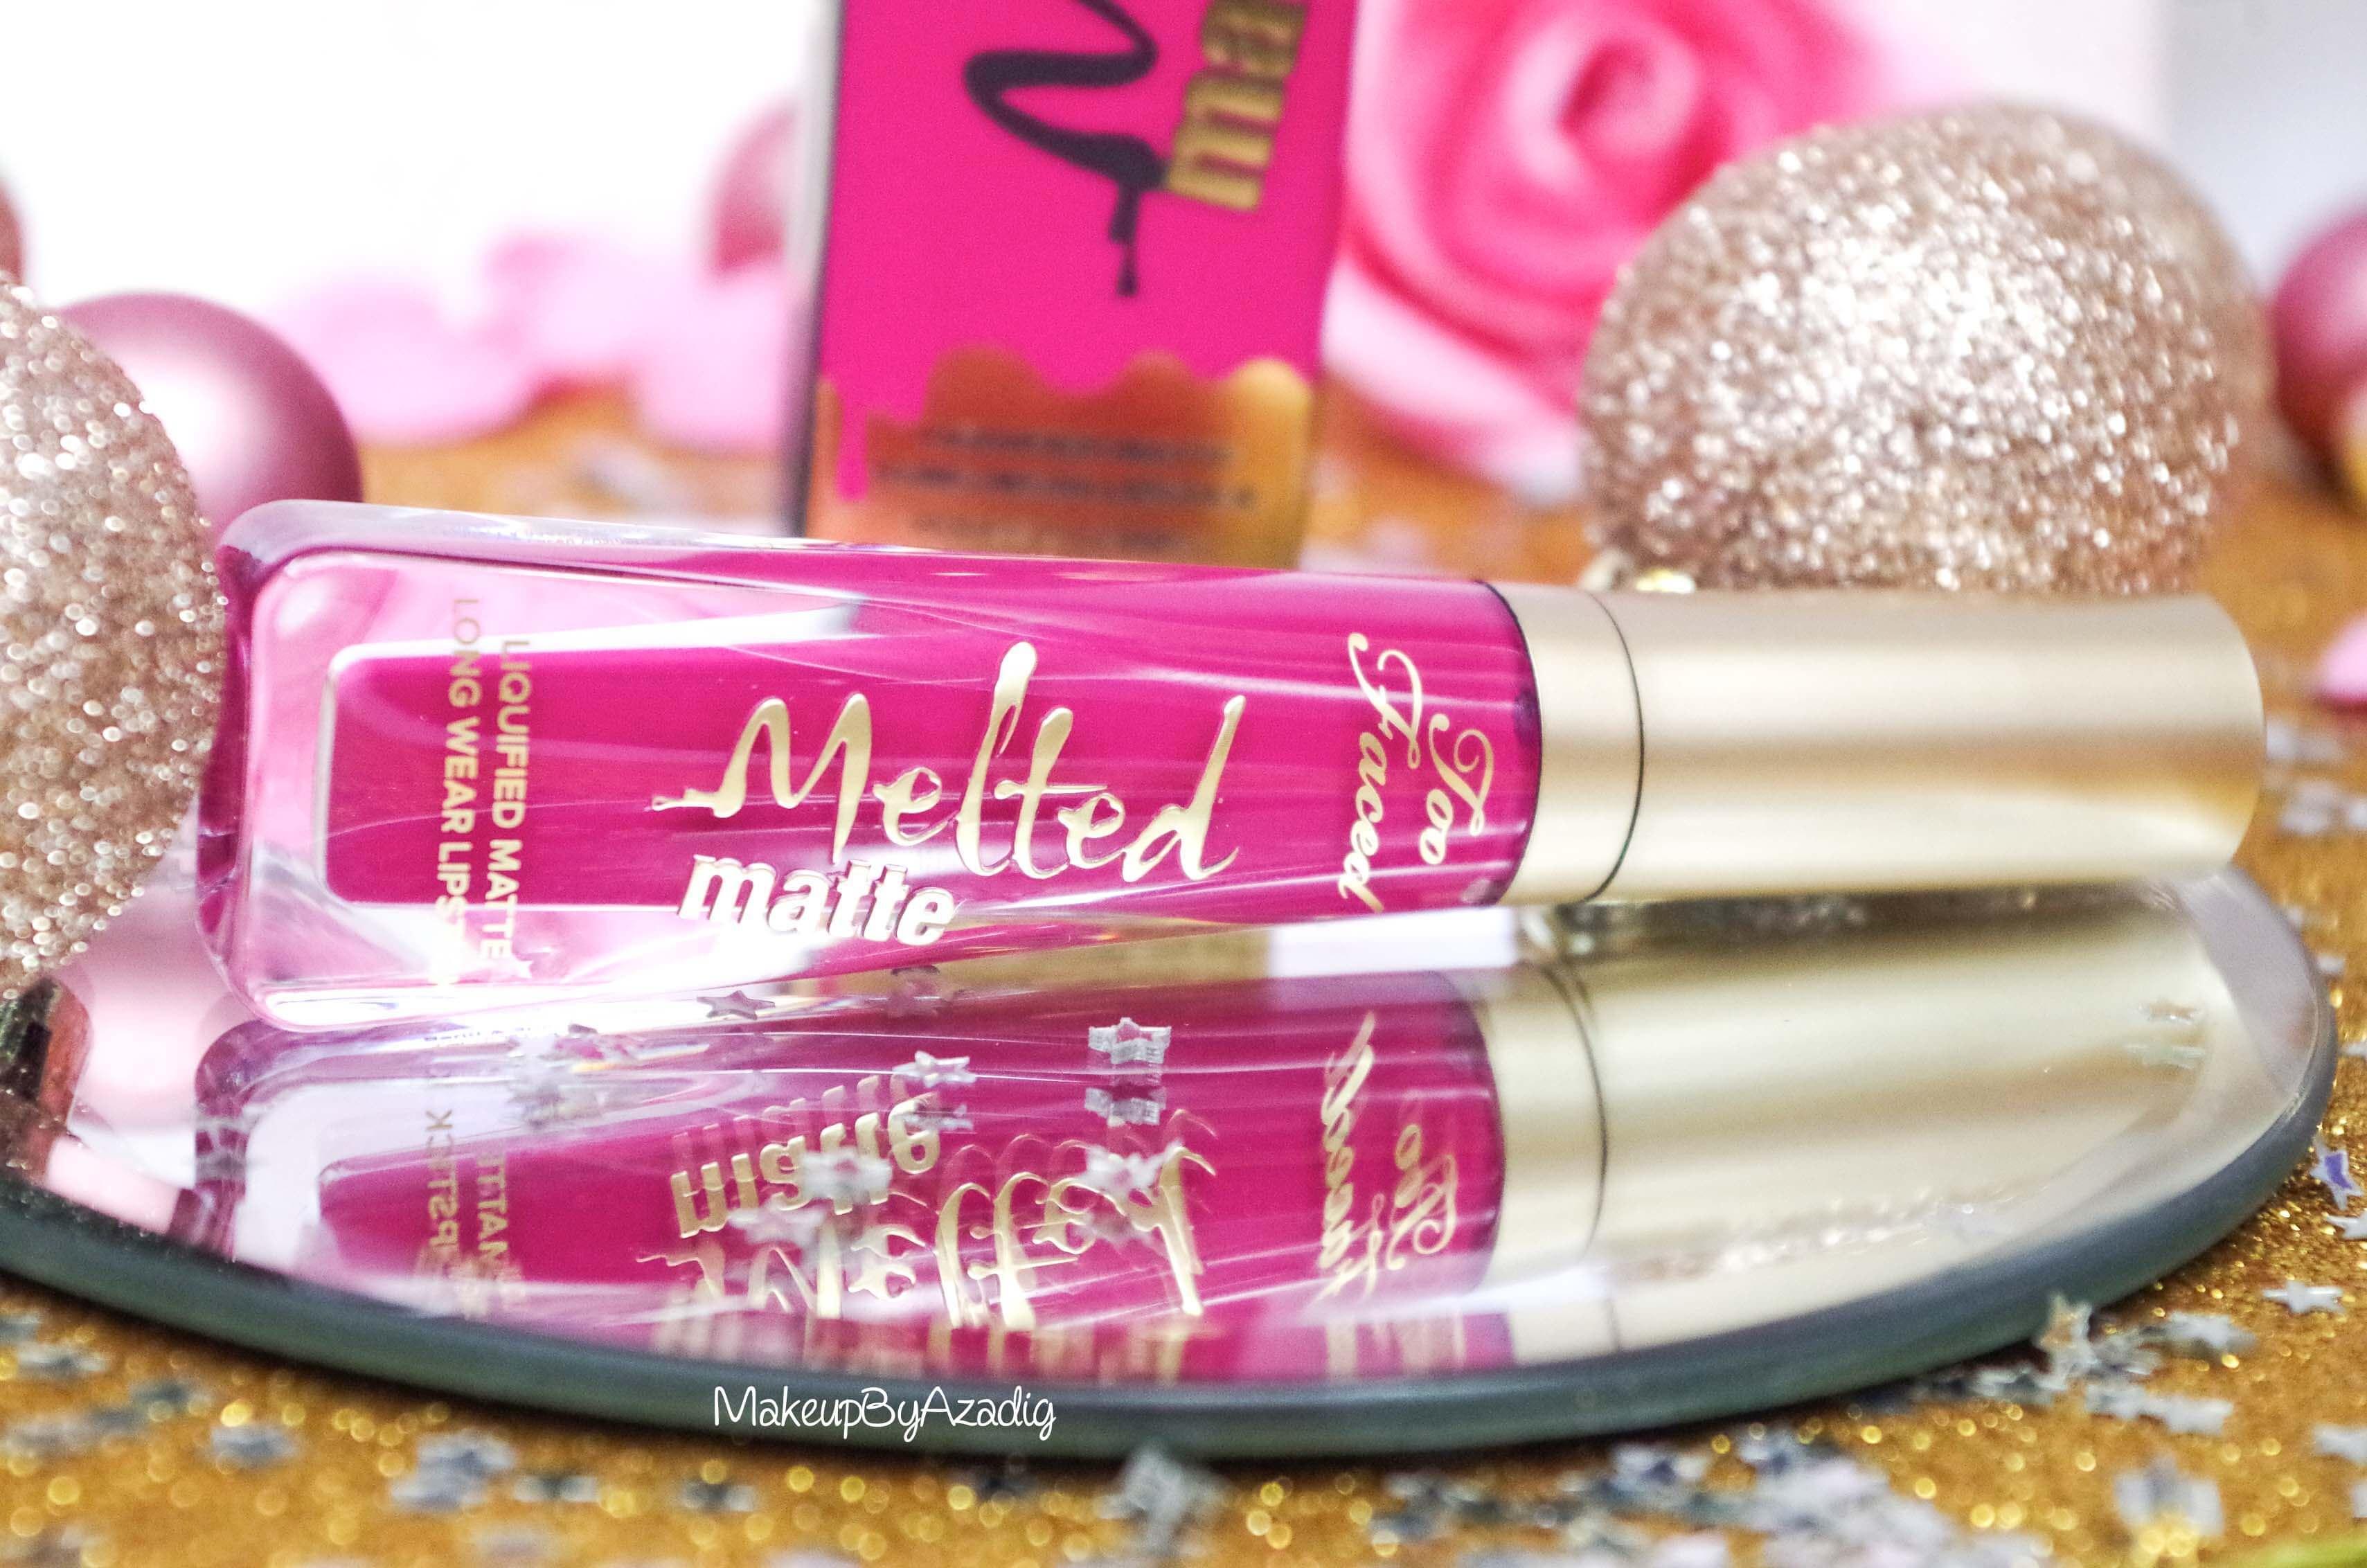 makeupbyazadig-melted-matte-queenb-bendandsnap-influencer-too-faced-rouge-levres-revue-avis-prix-sephora-paris-blog-liquide-lips